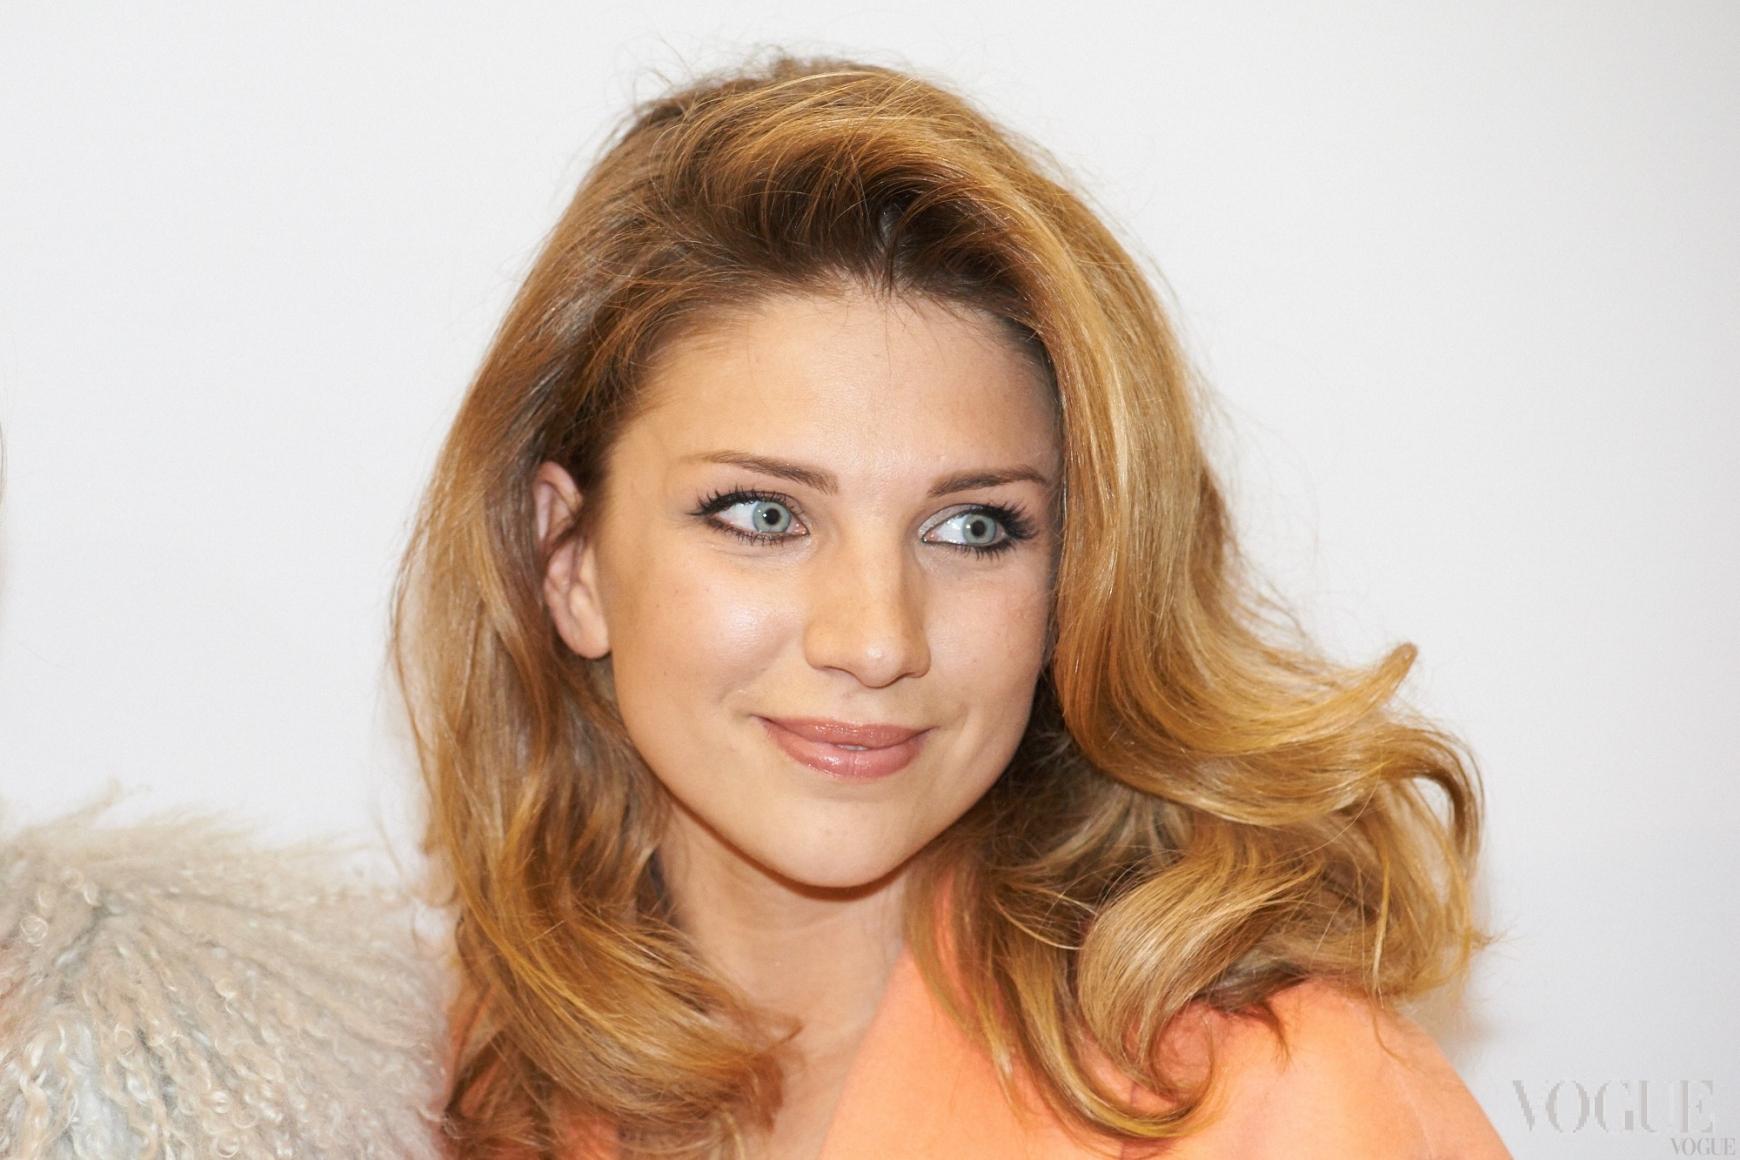 Екатерина Сильченко